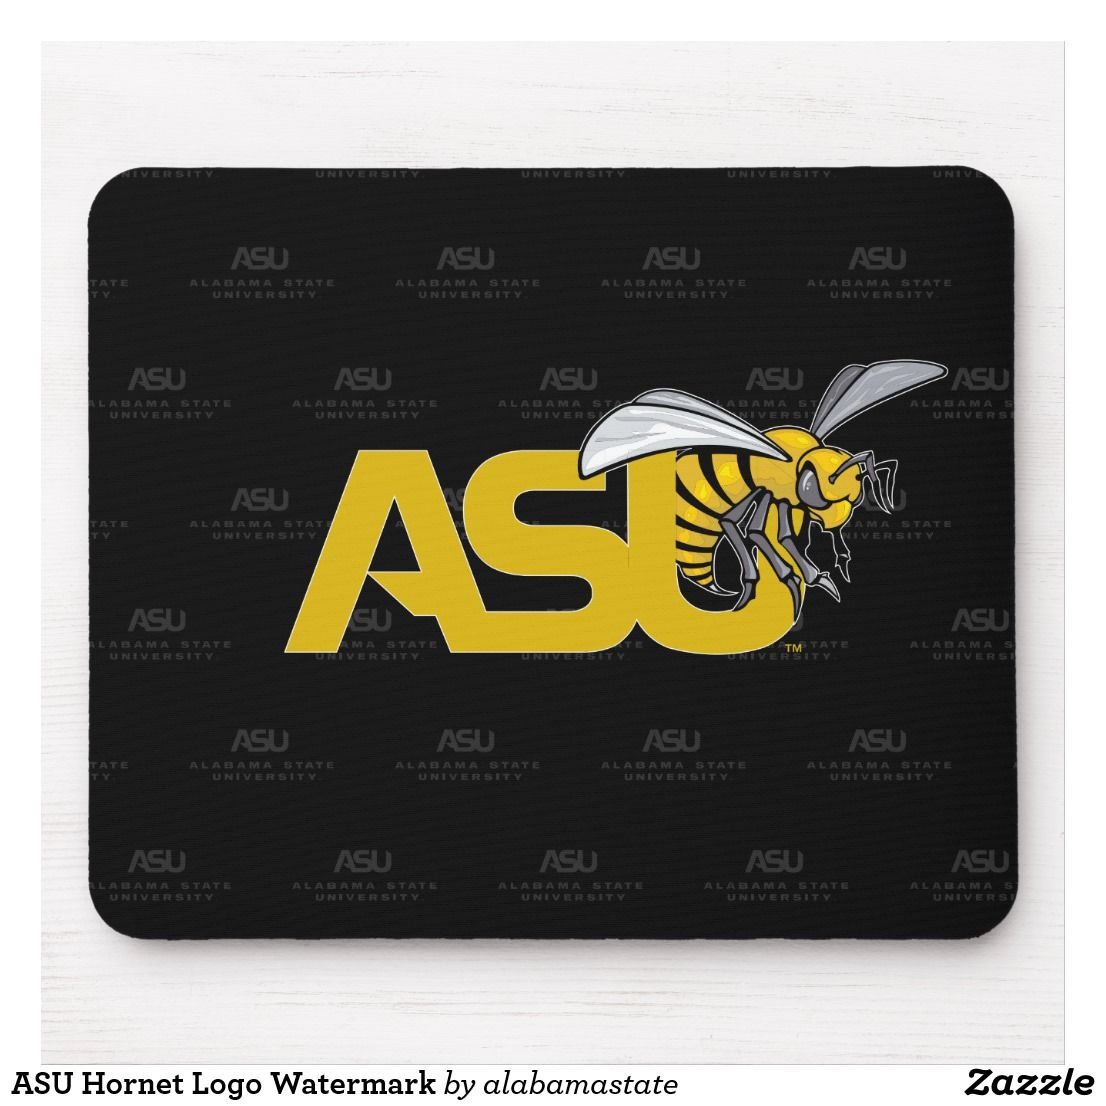 Asu Hornet Logo Watermark Mouse Pad Zazzle Com Hornet Logos